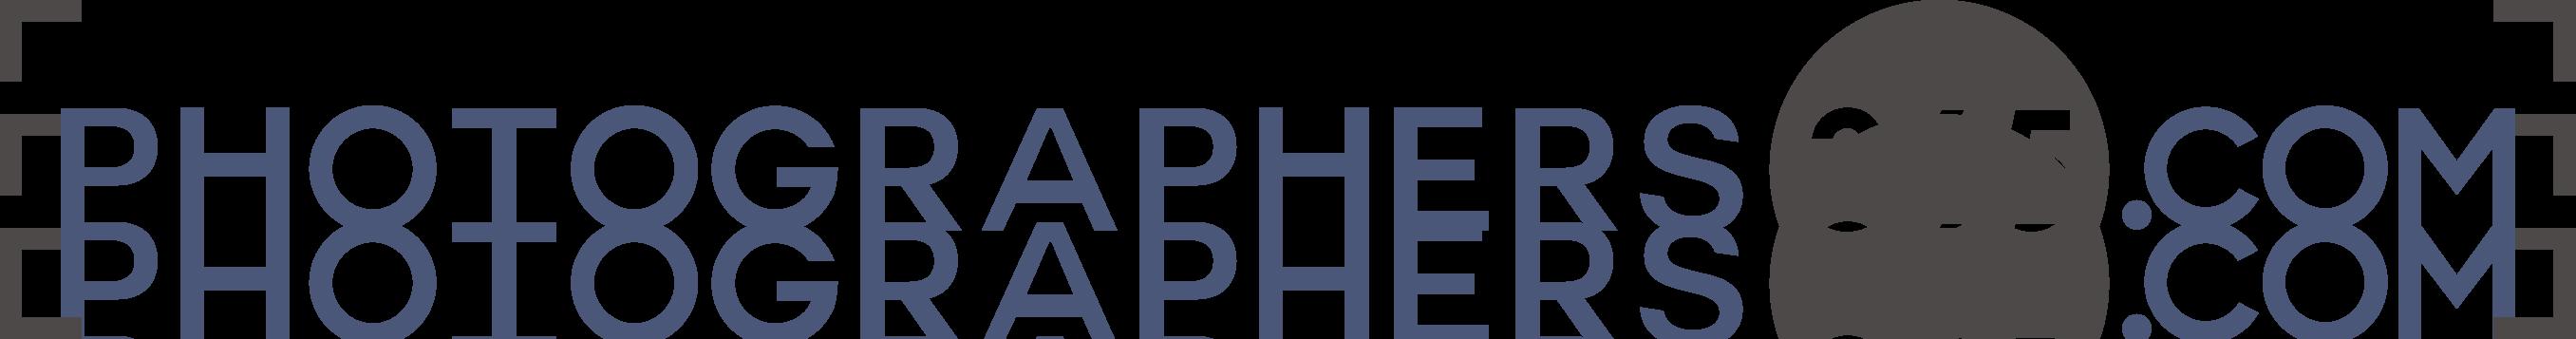 Logo for a Photographer Search Portal